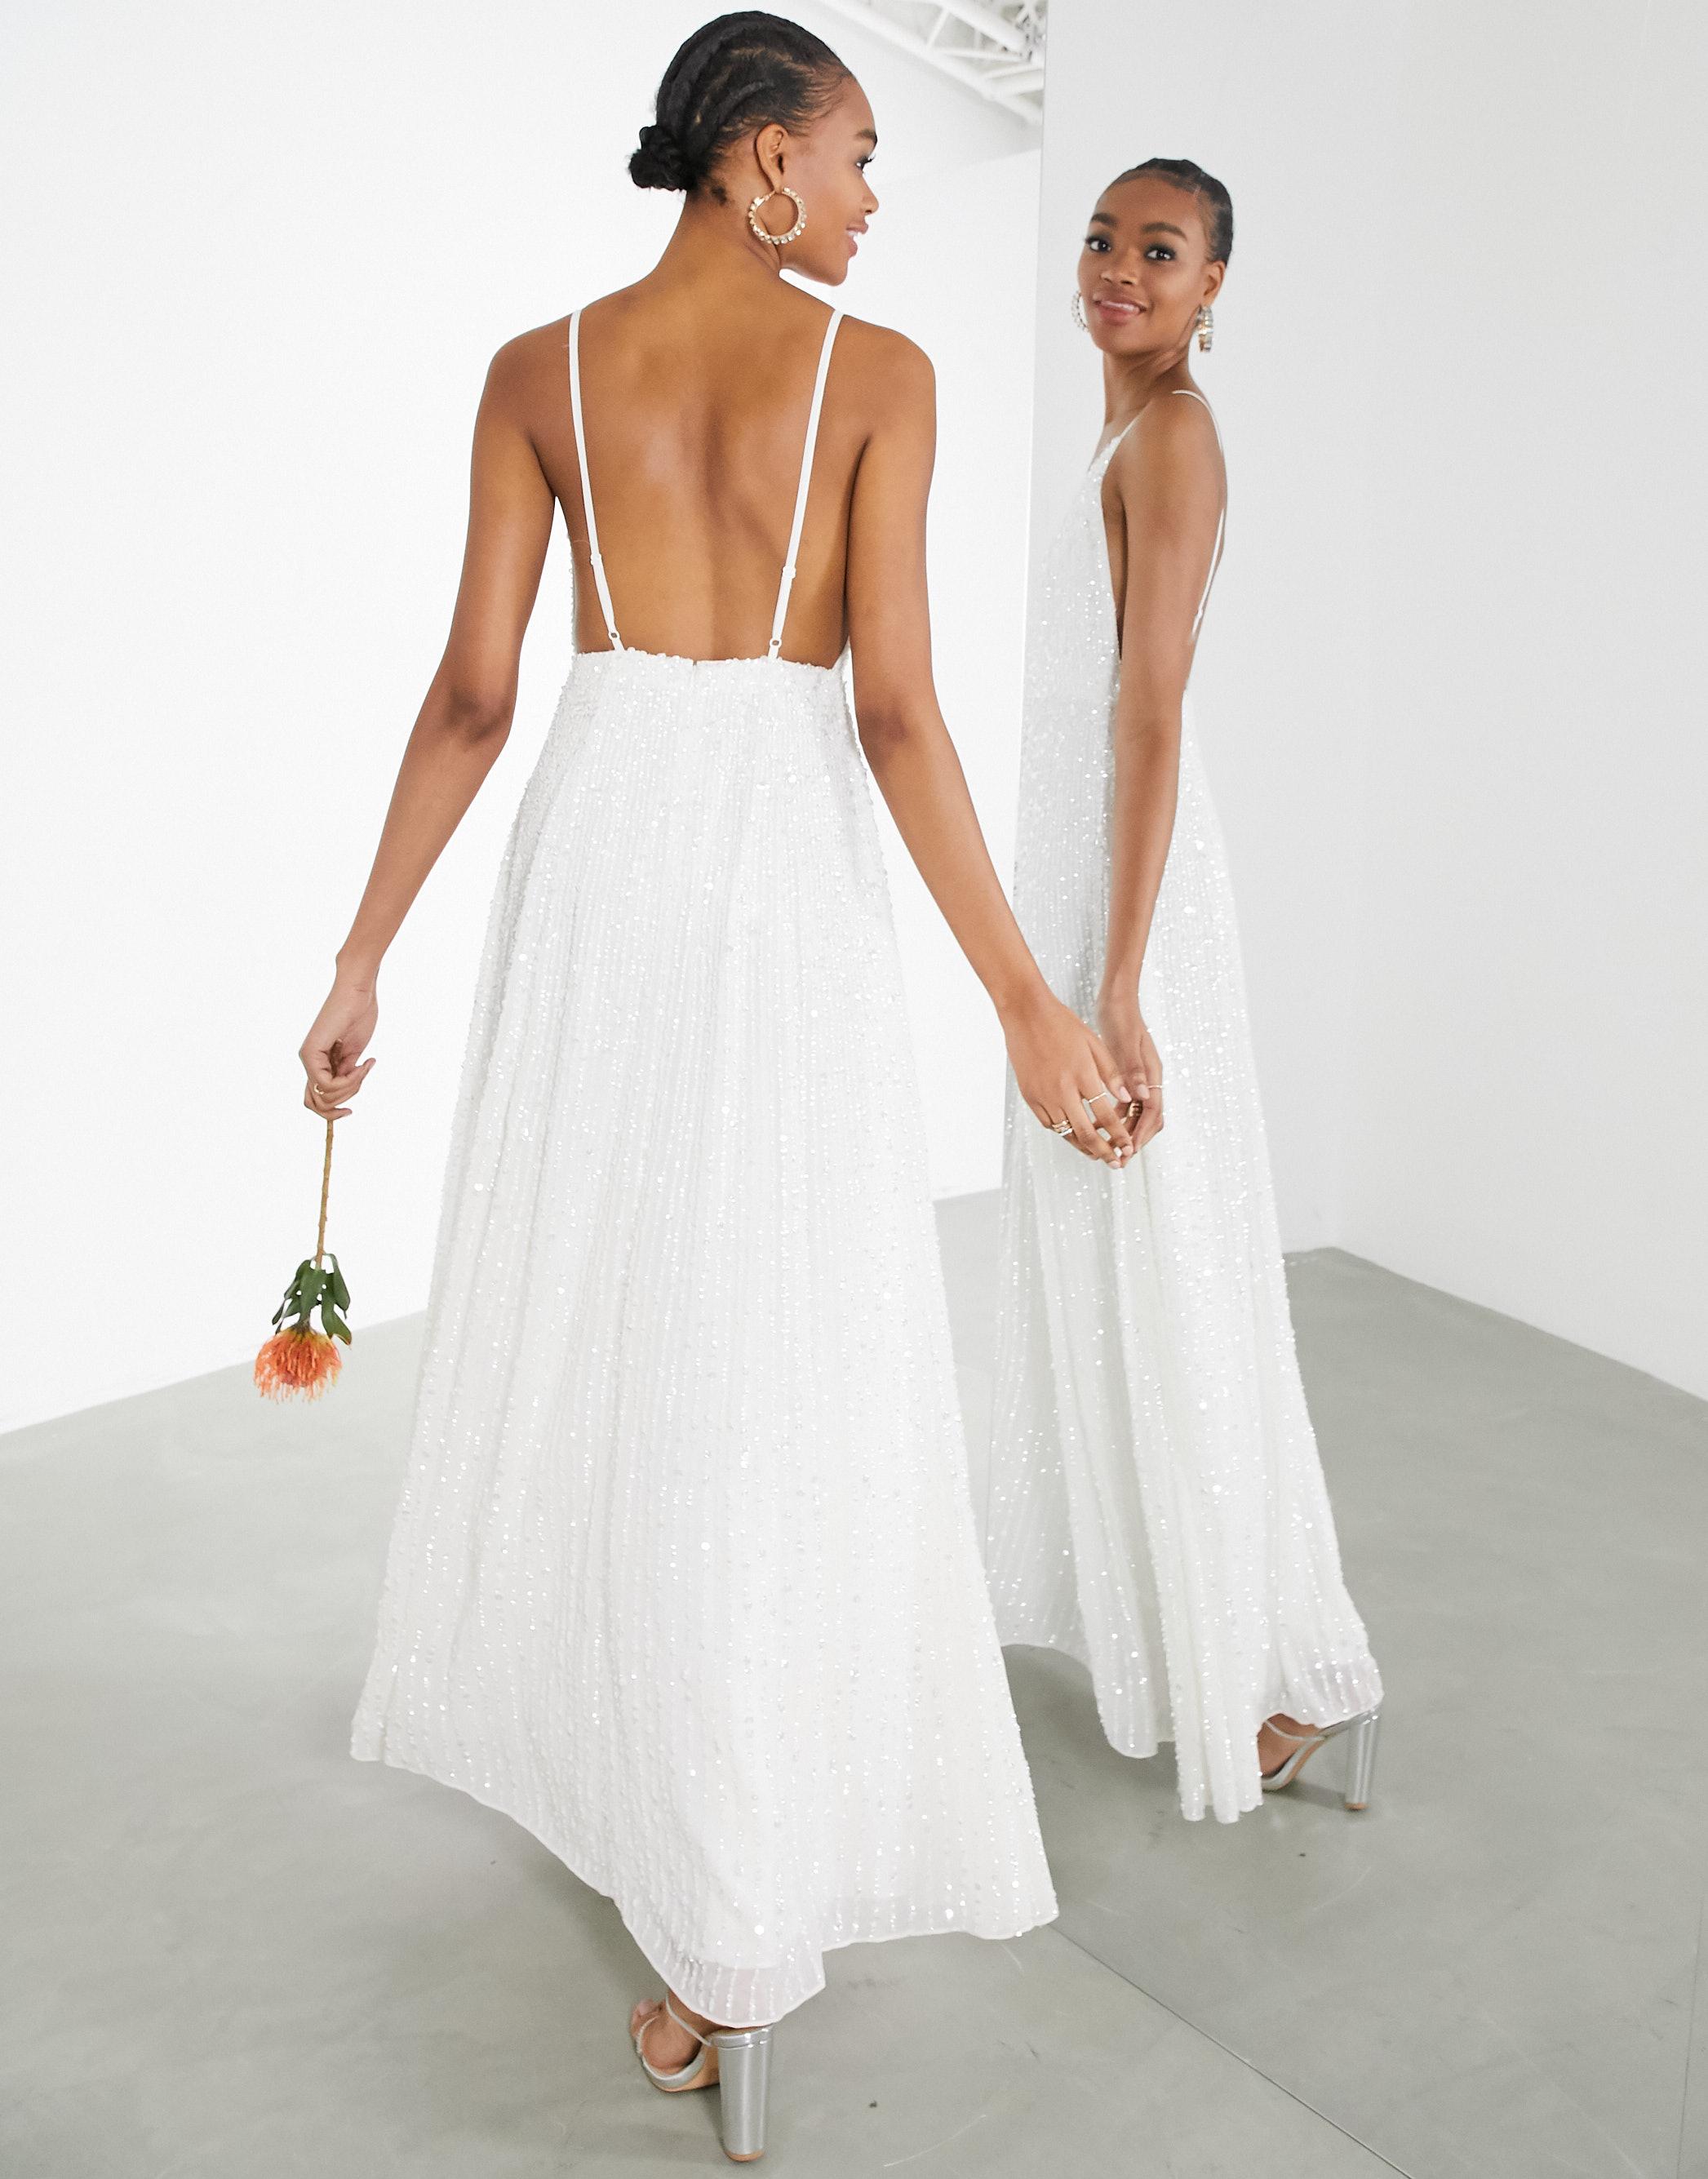 Vestido de novia de tirantes con lentejuelas